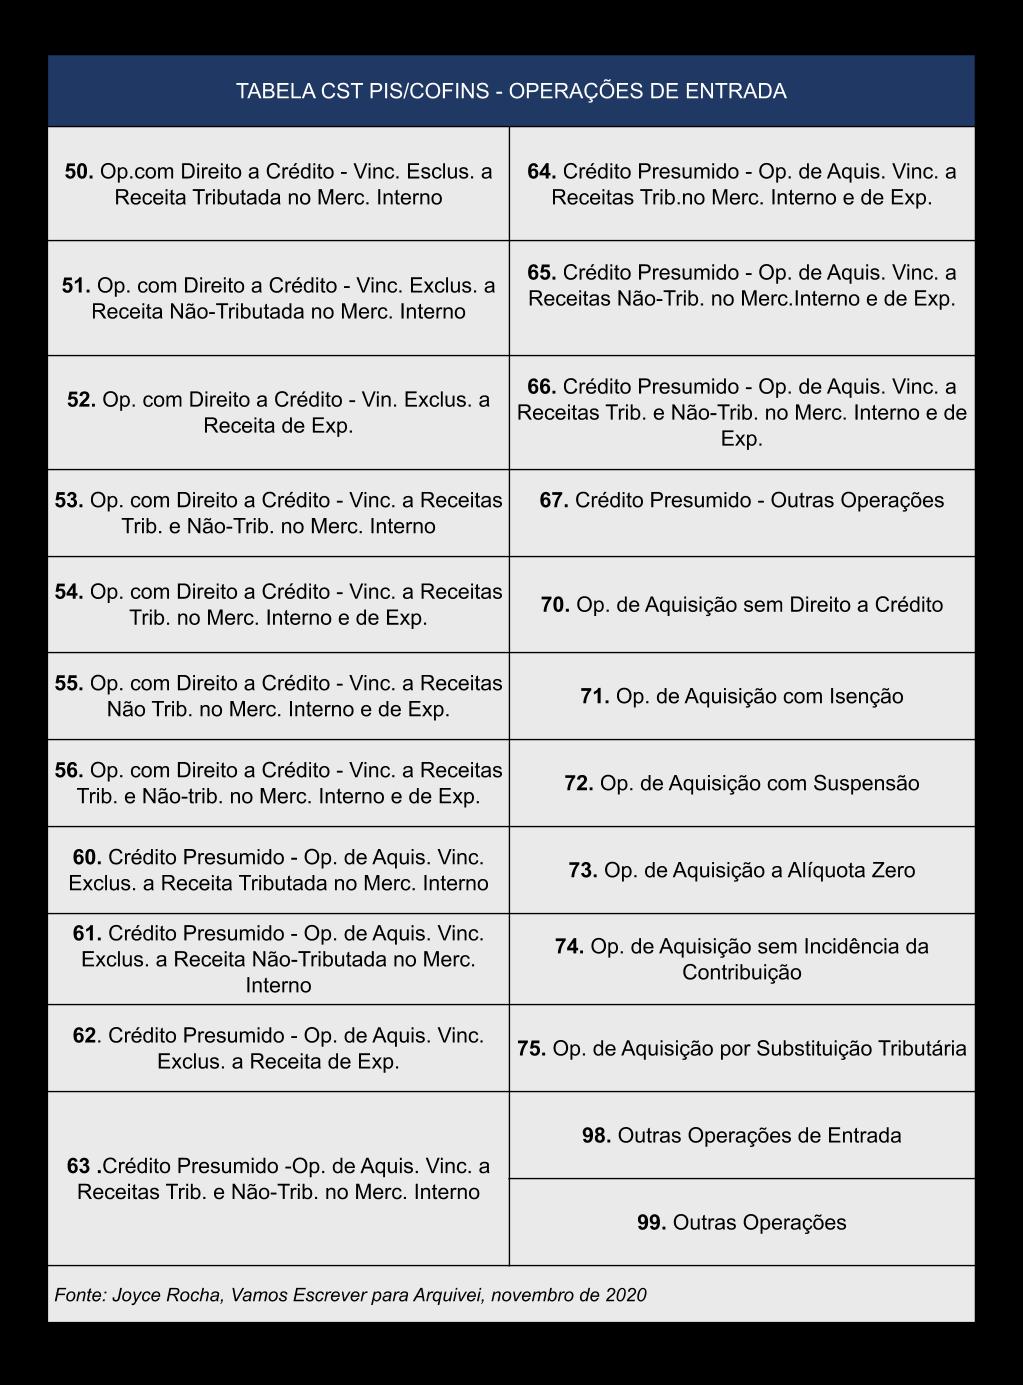 04 TABELA-CST-PIS-COFINS-JOYCE-ROCHA